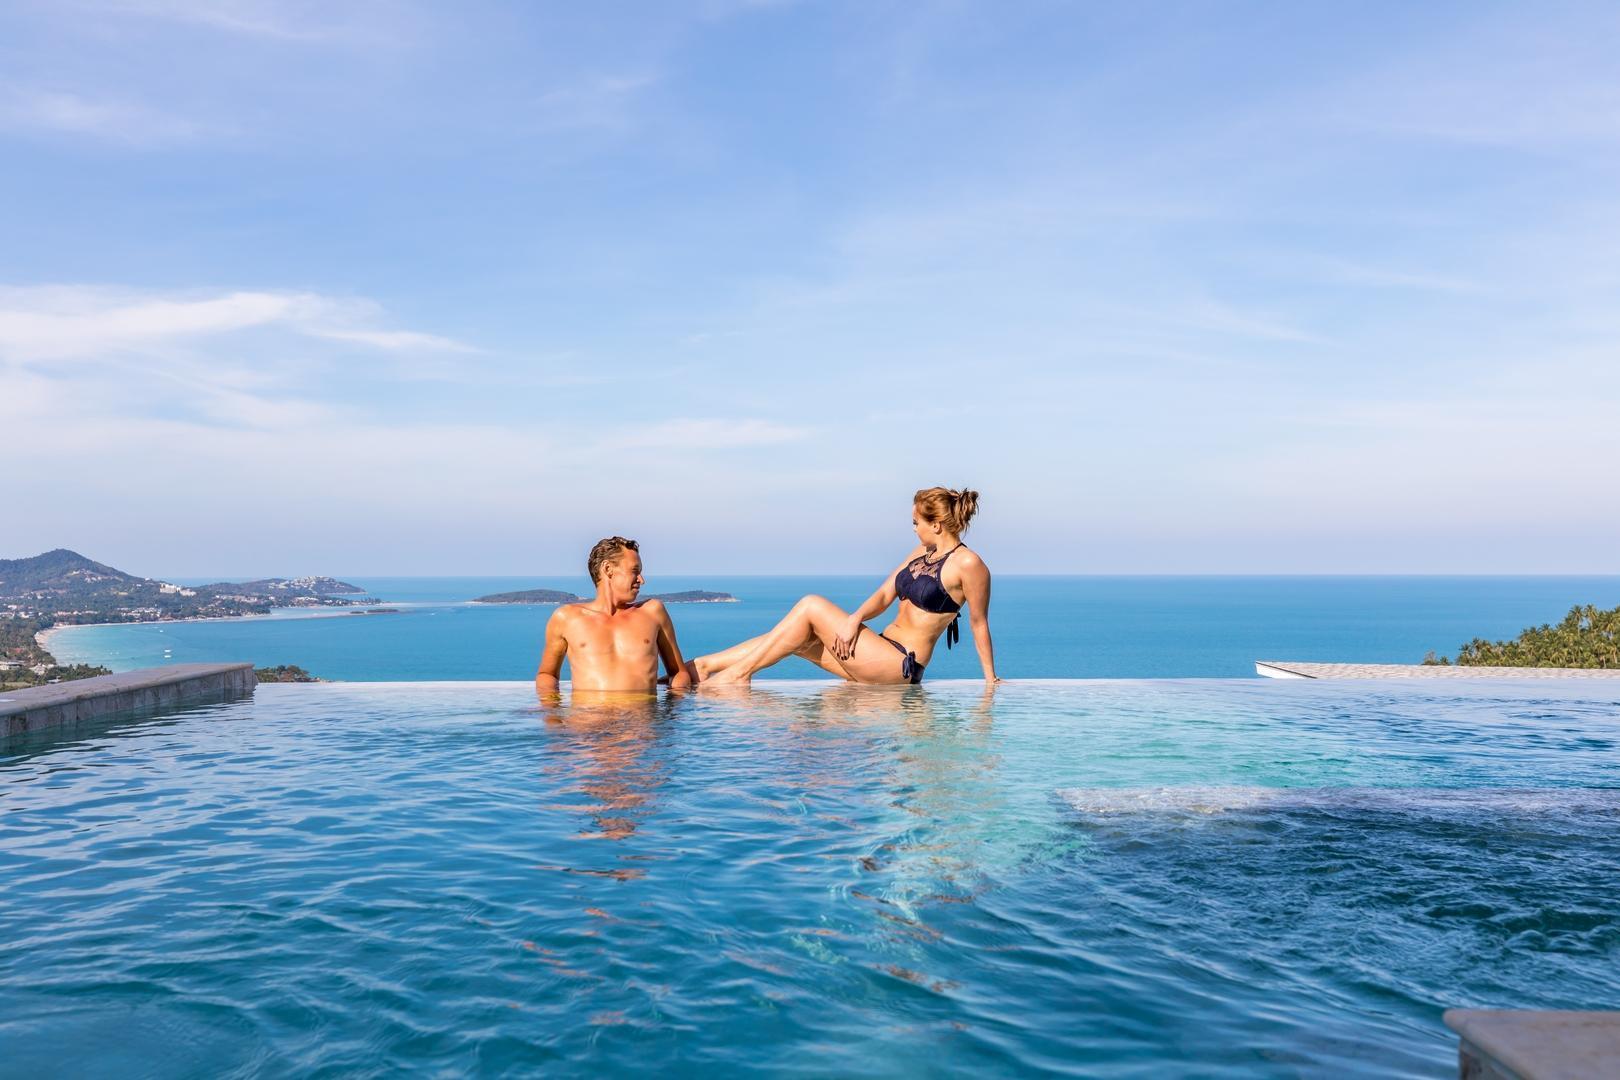 Chaweng Noi Luxury Morden Style 4-BR Dream Villa วิลลา 4 ห้องนอน 4 ห้องน้ำส่วนตัว ขนาด 380 ตร.ม. – เฉวงน้อย